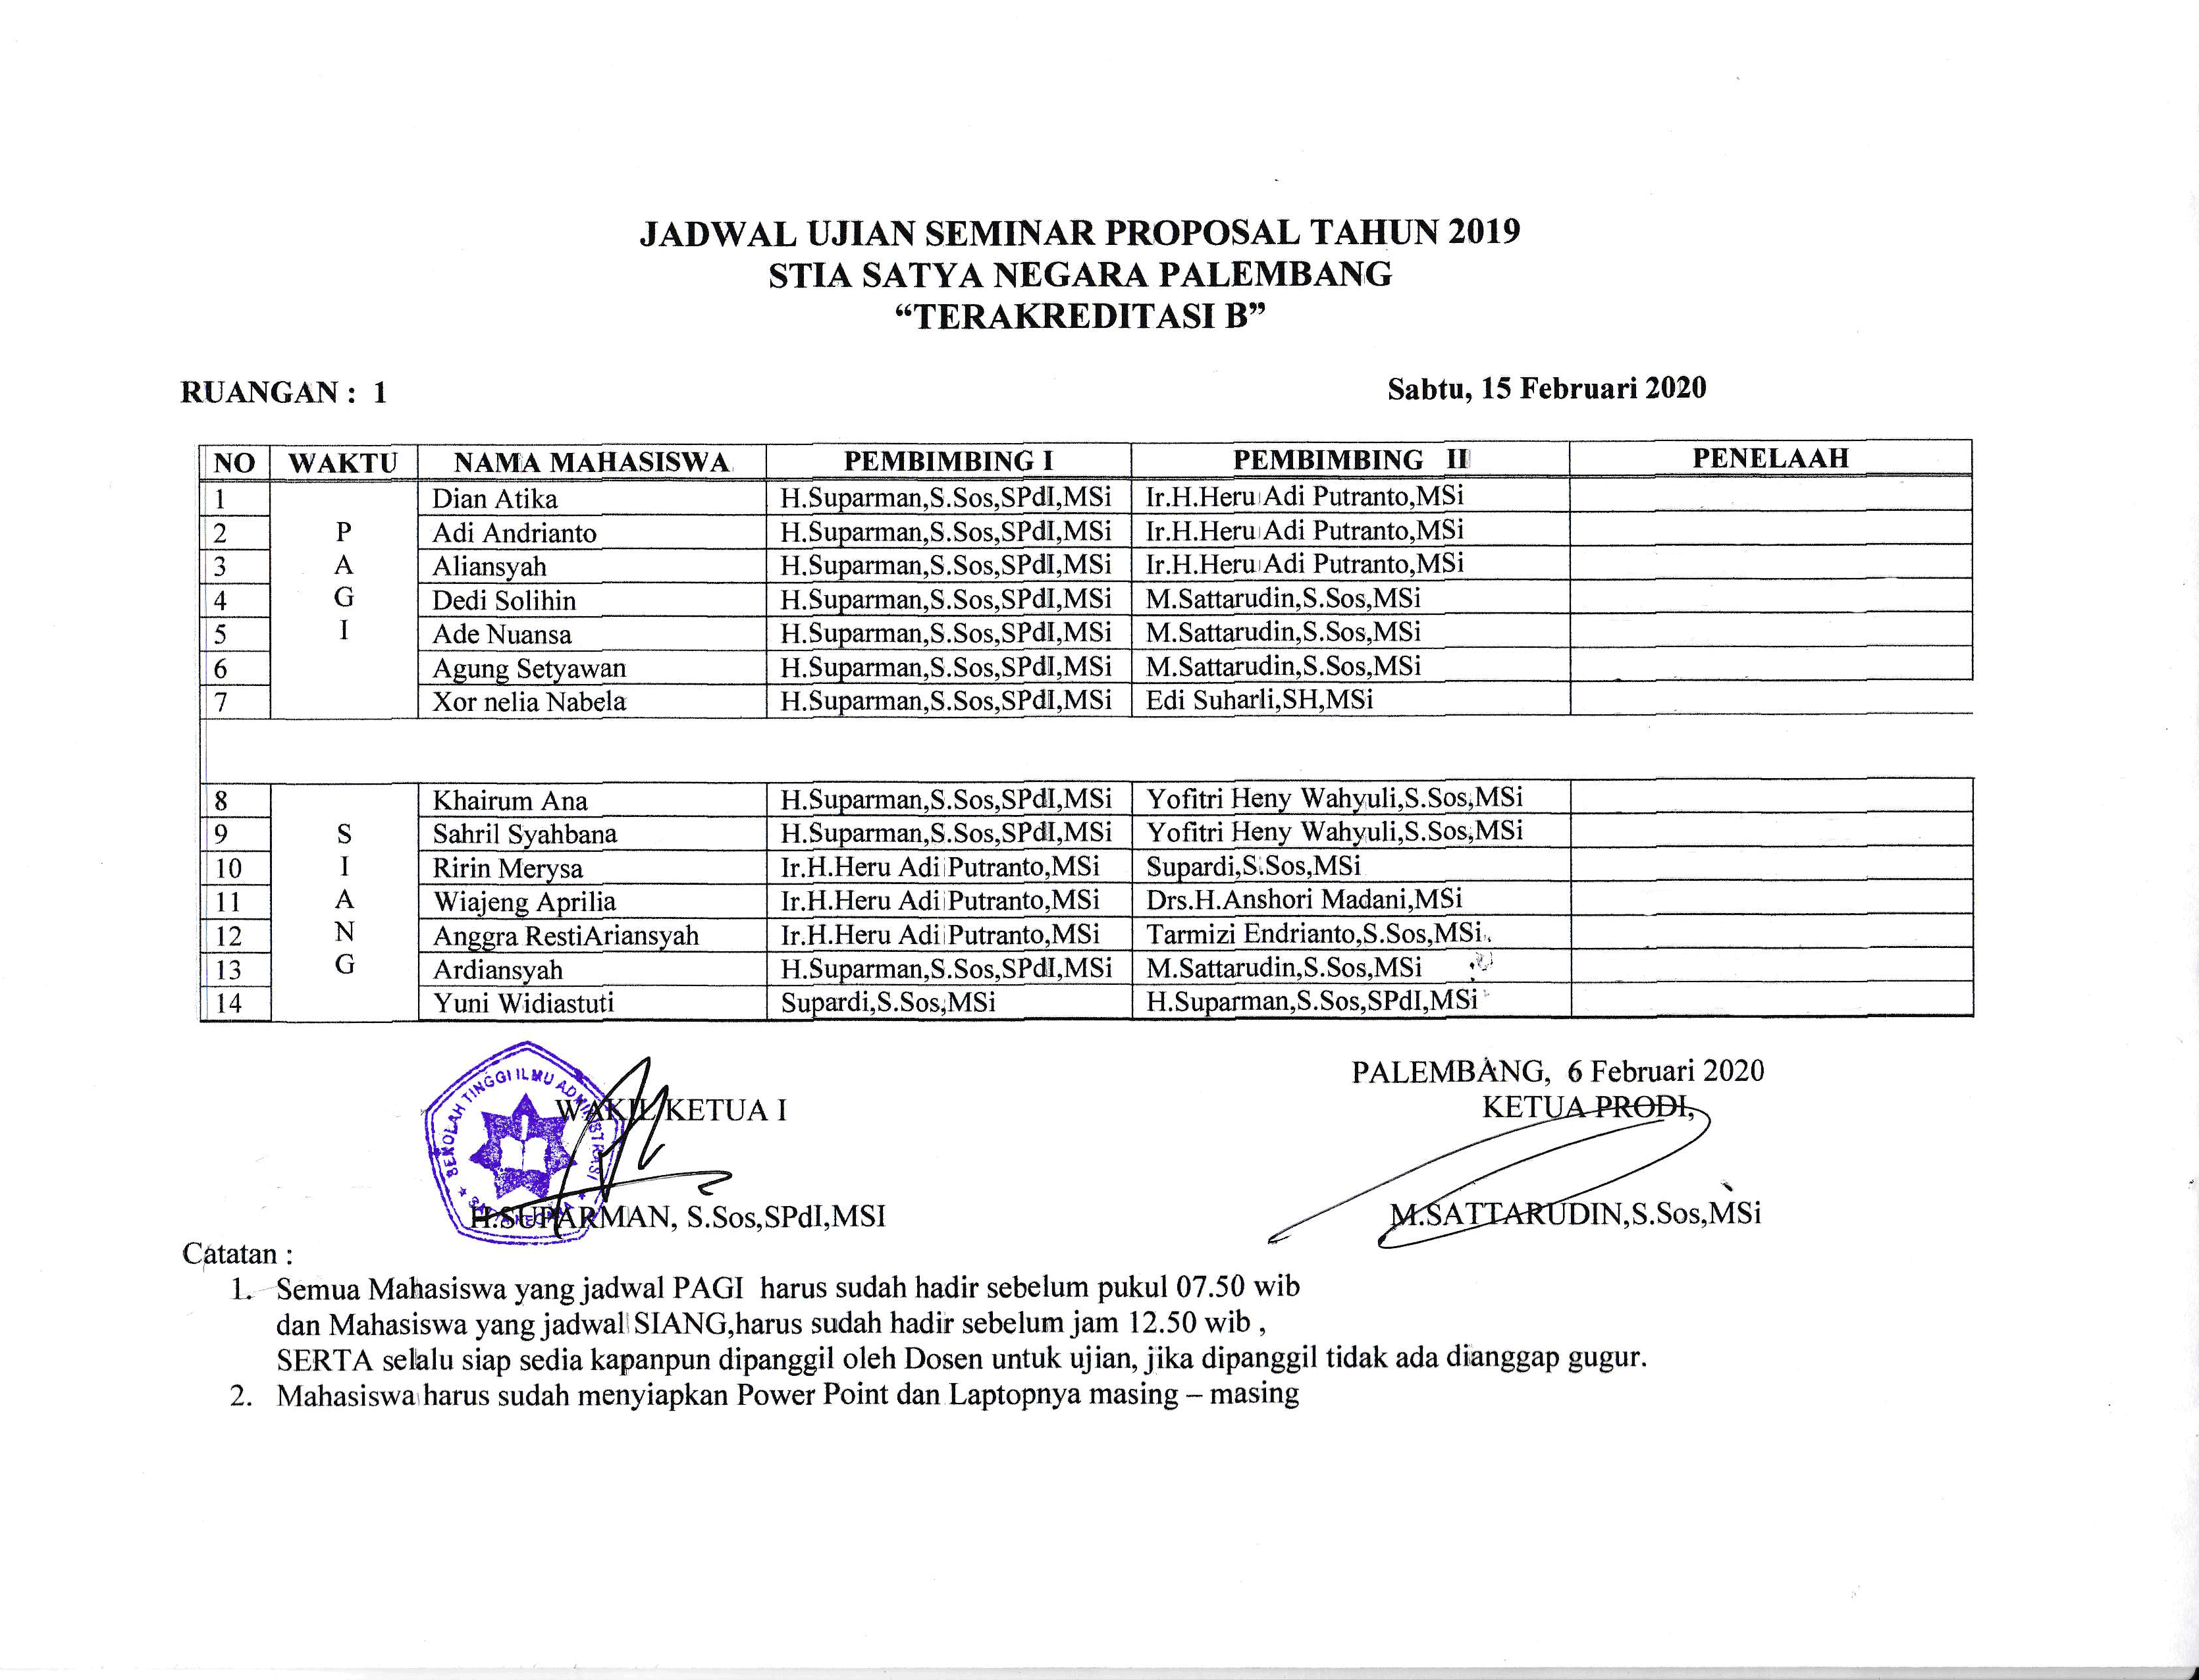 IMG_20200210_0002